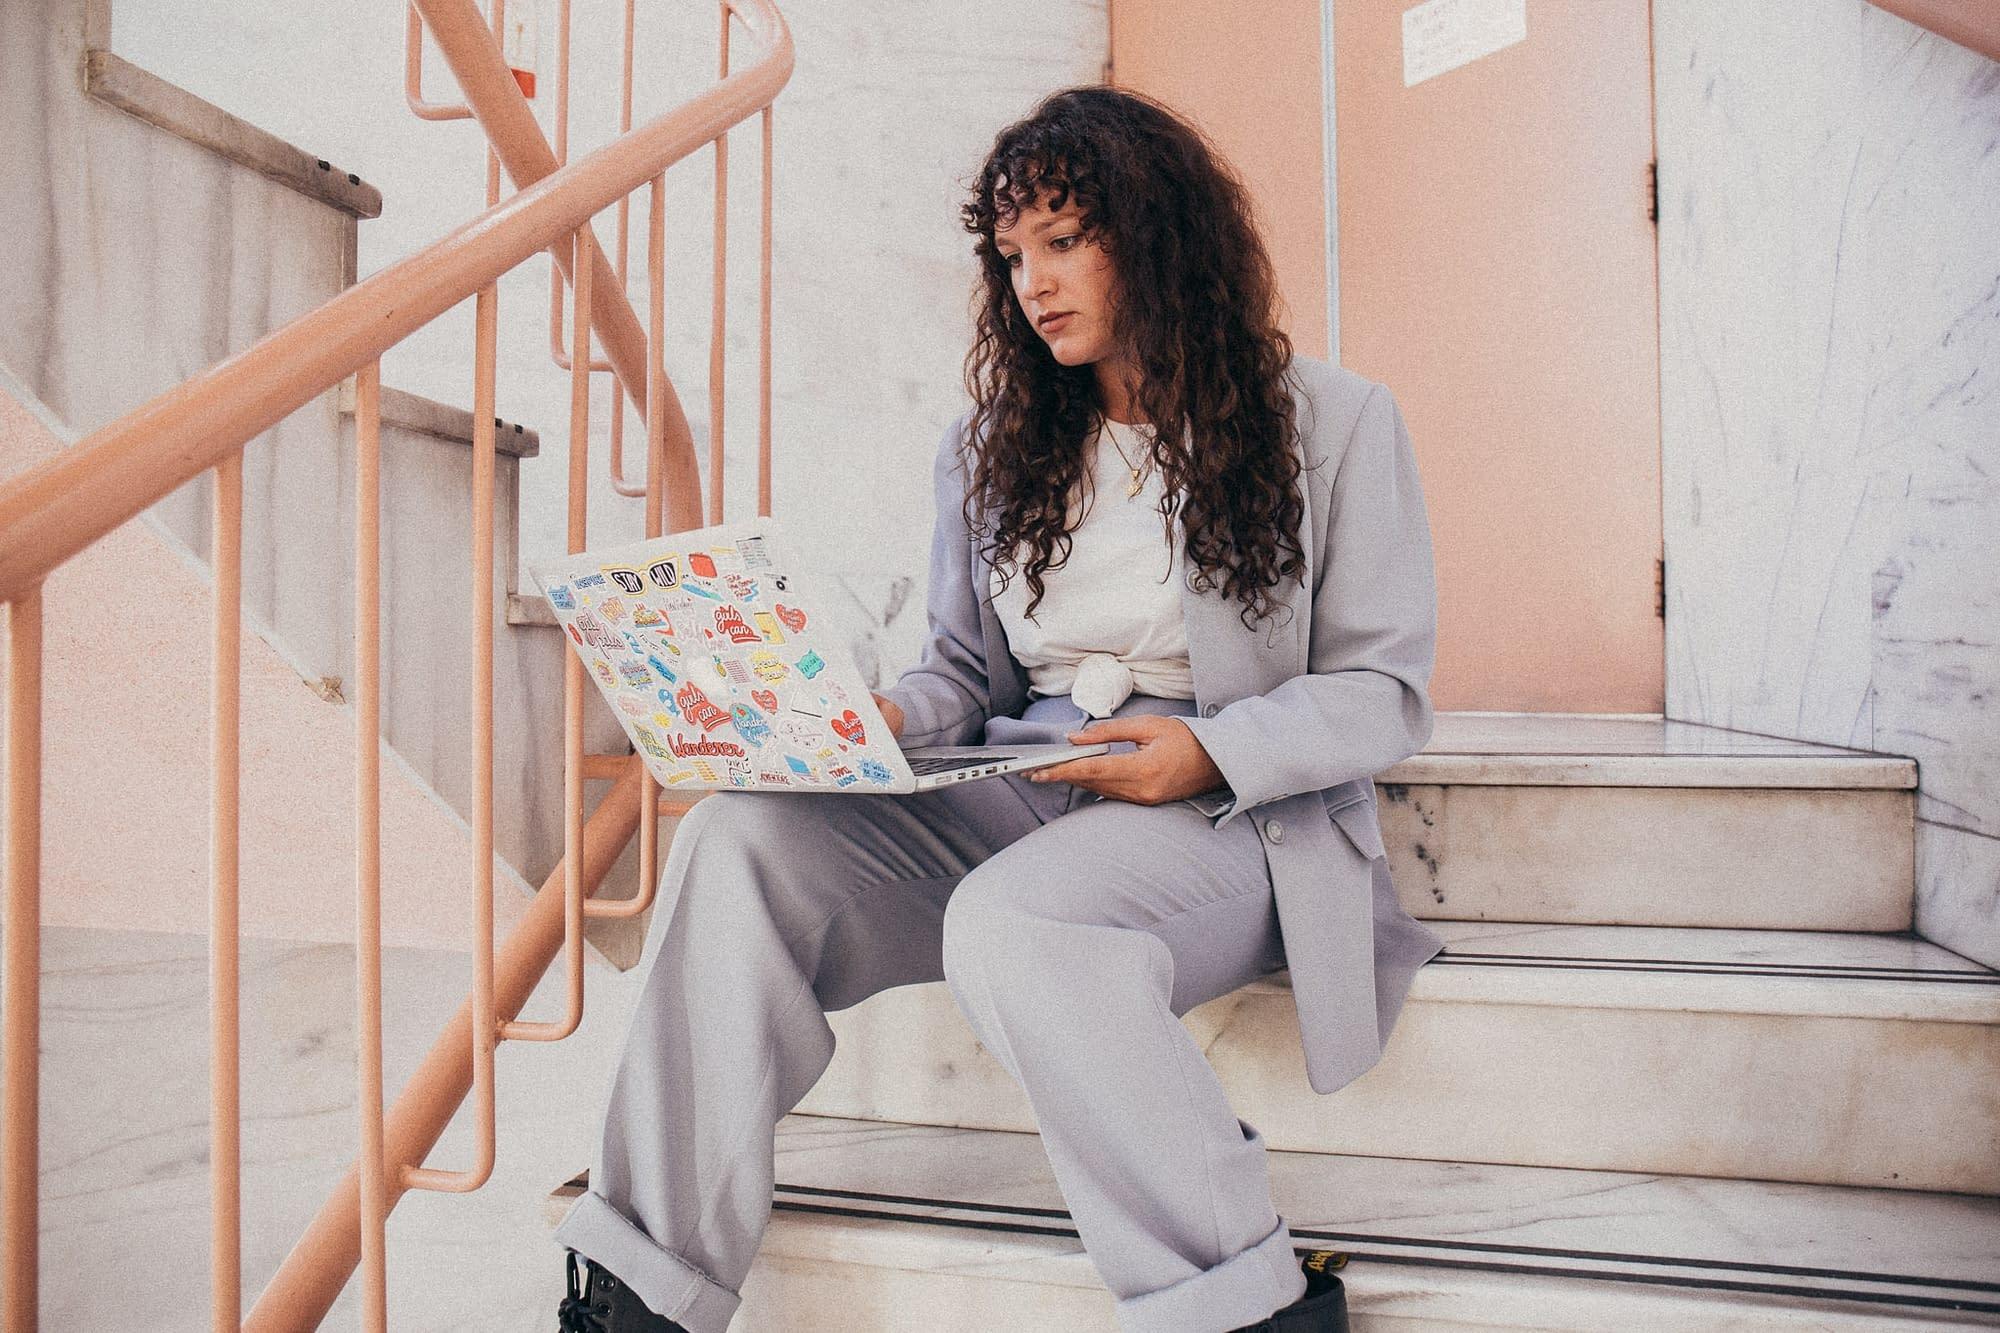 Women Making Moves | Martina Martian, Designer and Traveler